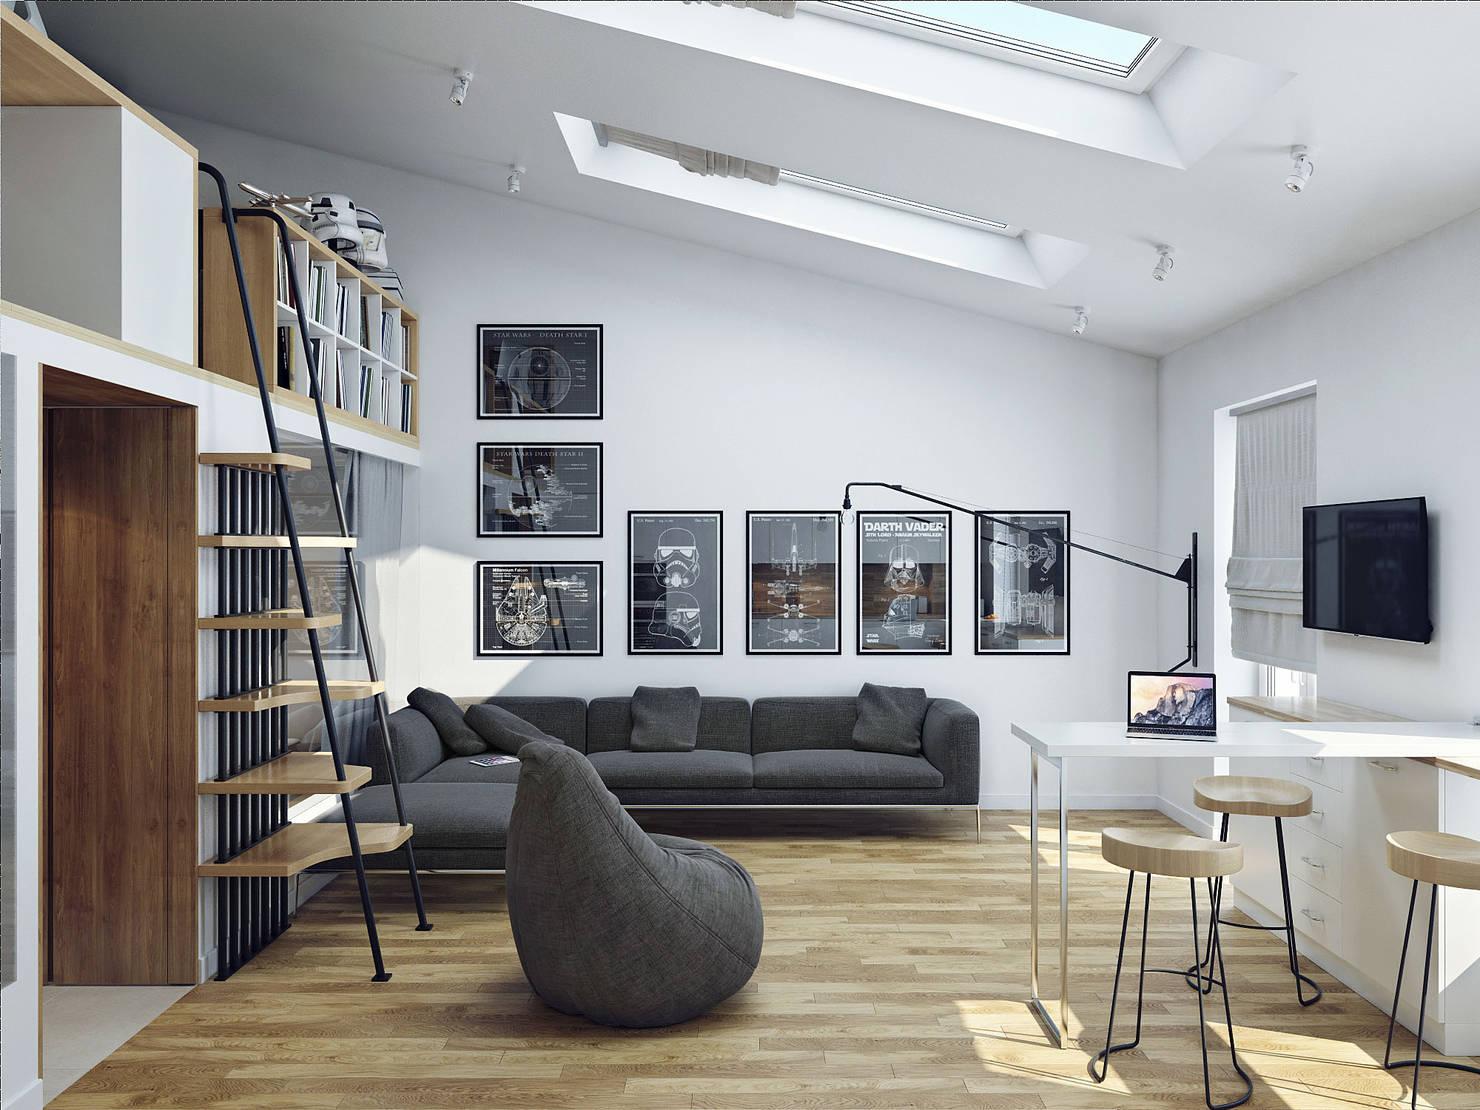 10 organisational hacks every one-room apartment needs